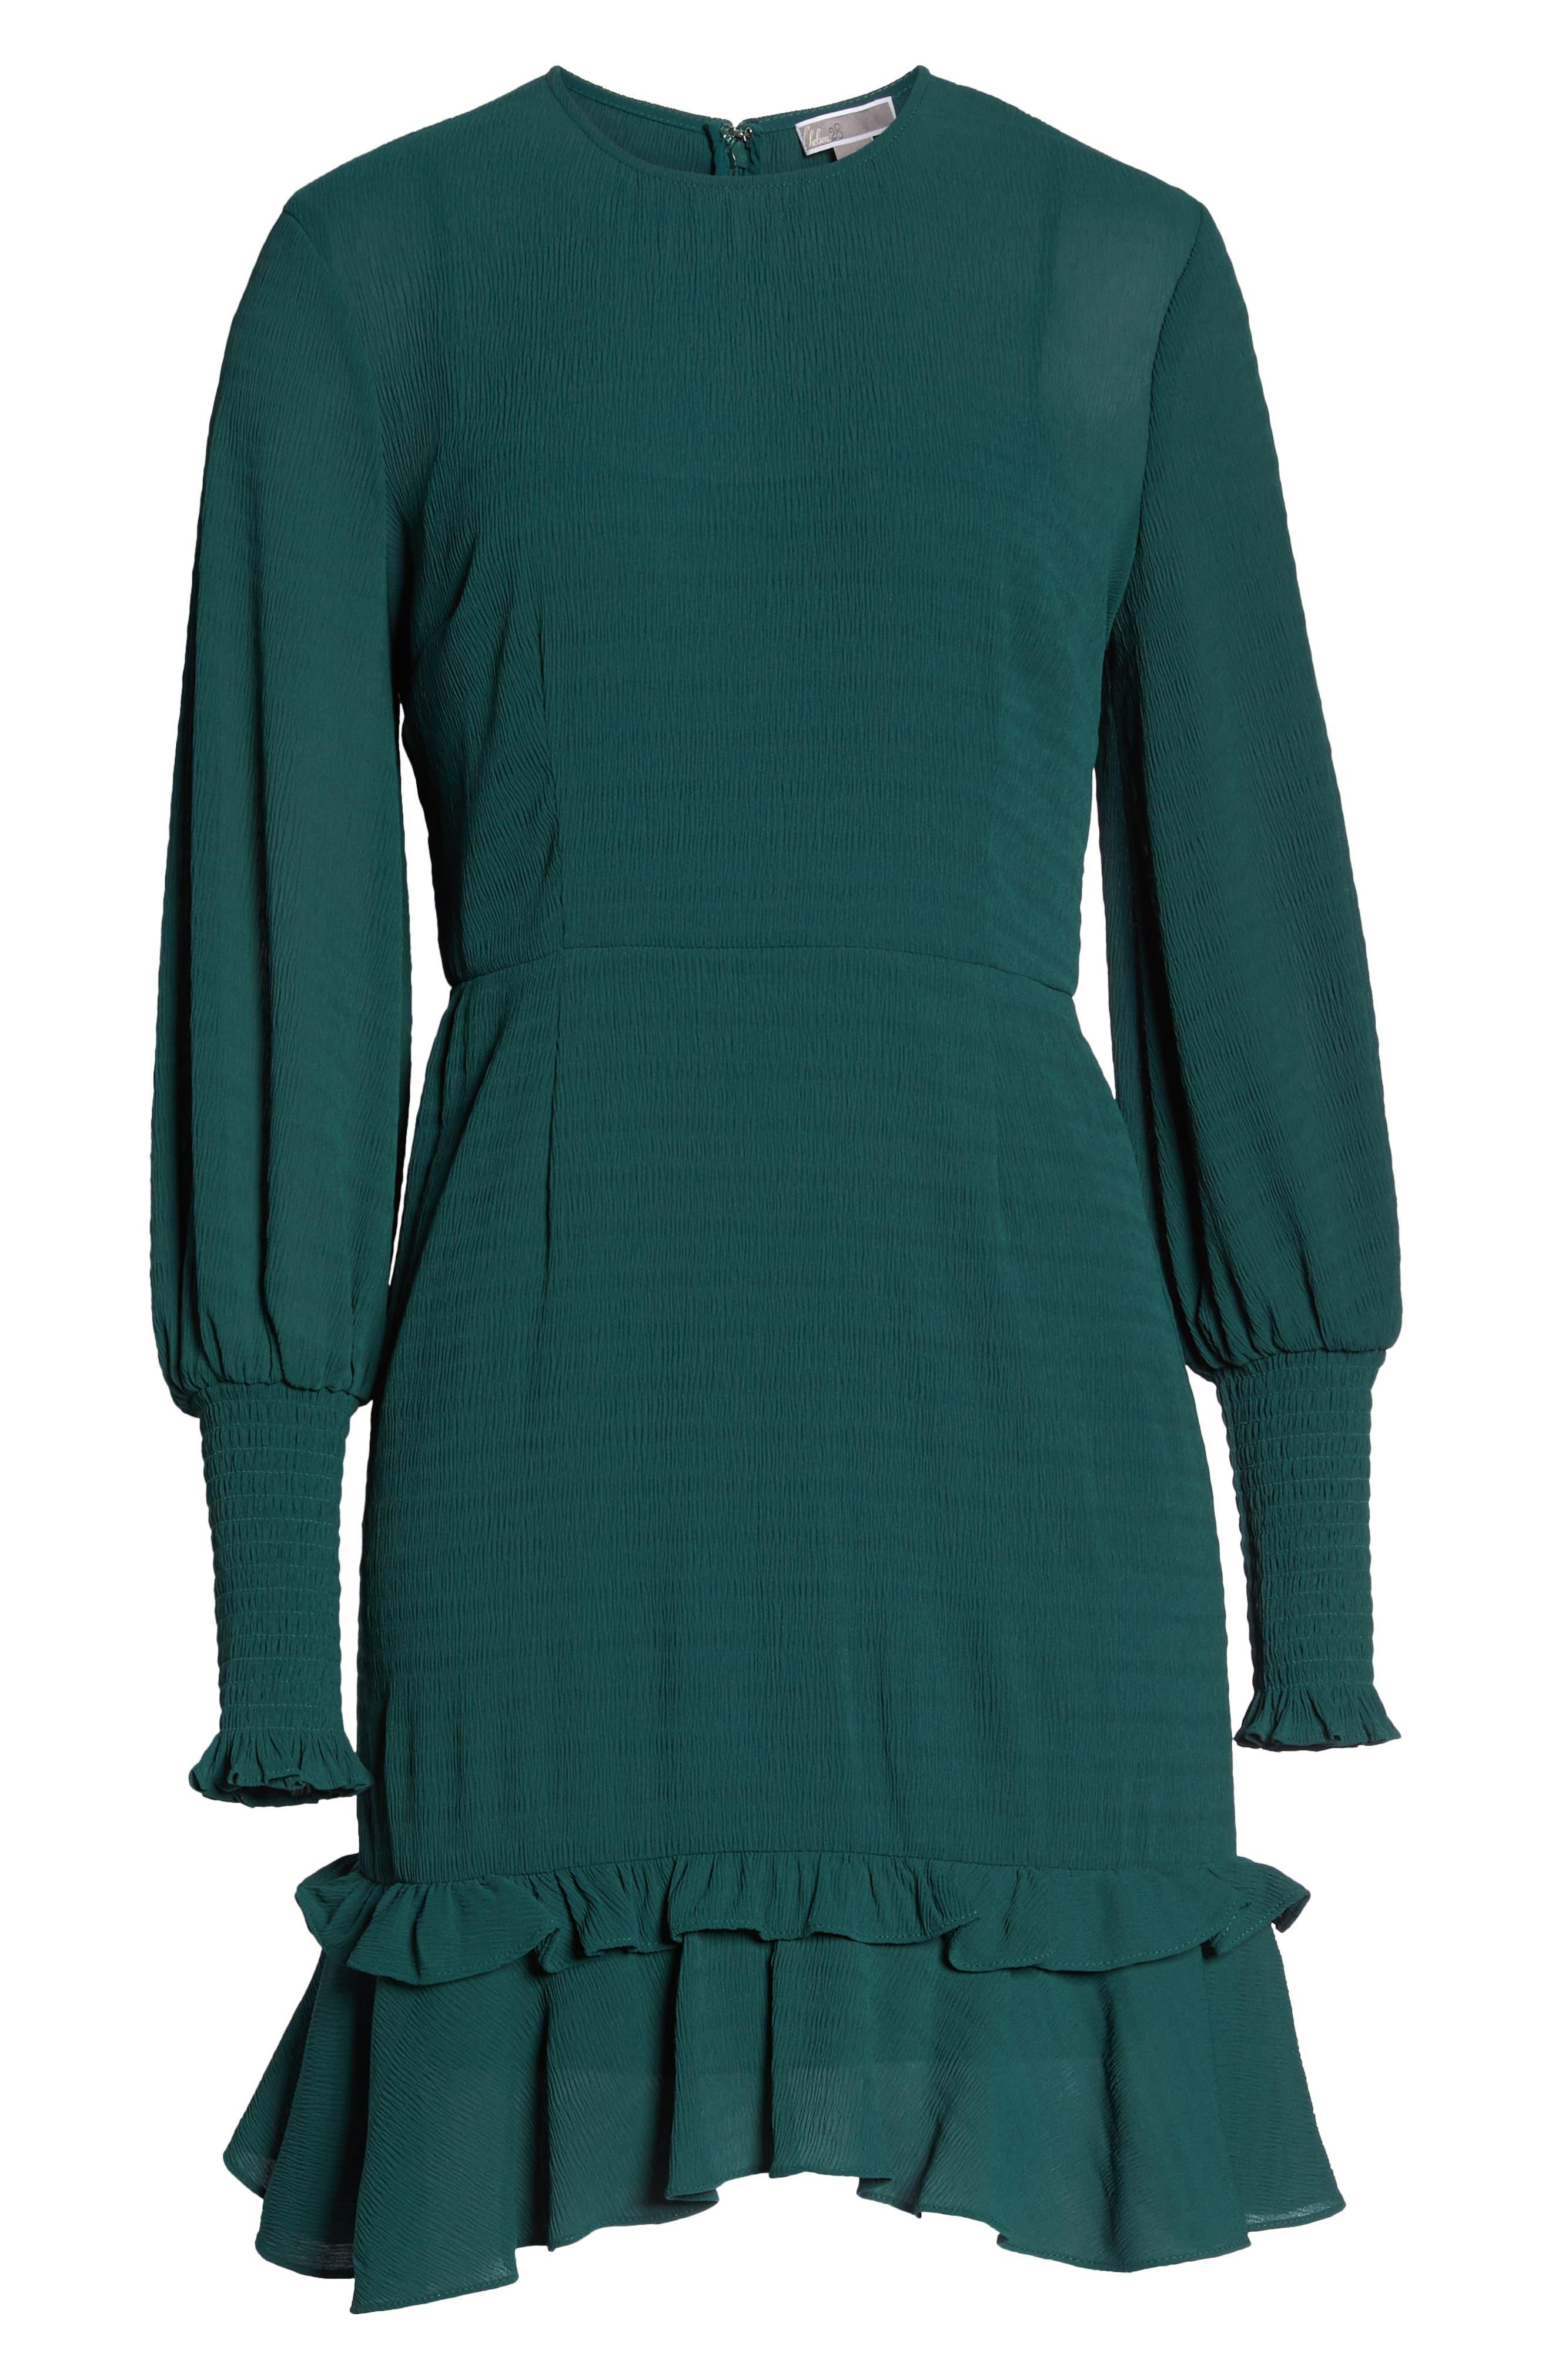 CHELSEA28, Ruffle A-Line Dress, Alternate thumbnail 7, color, 301